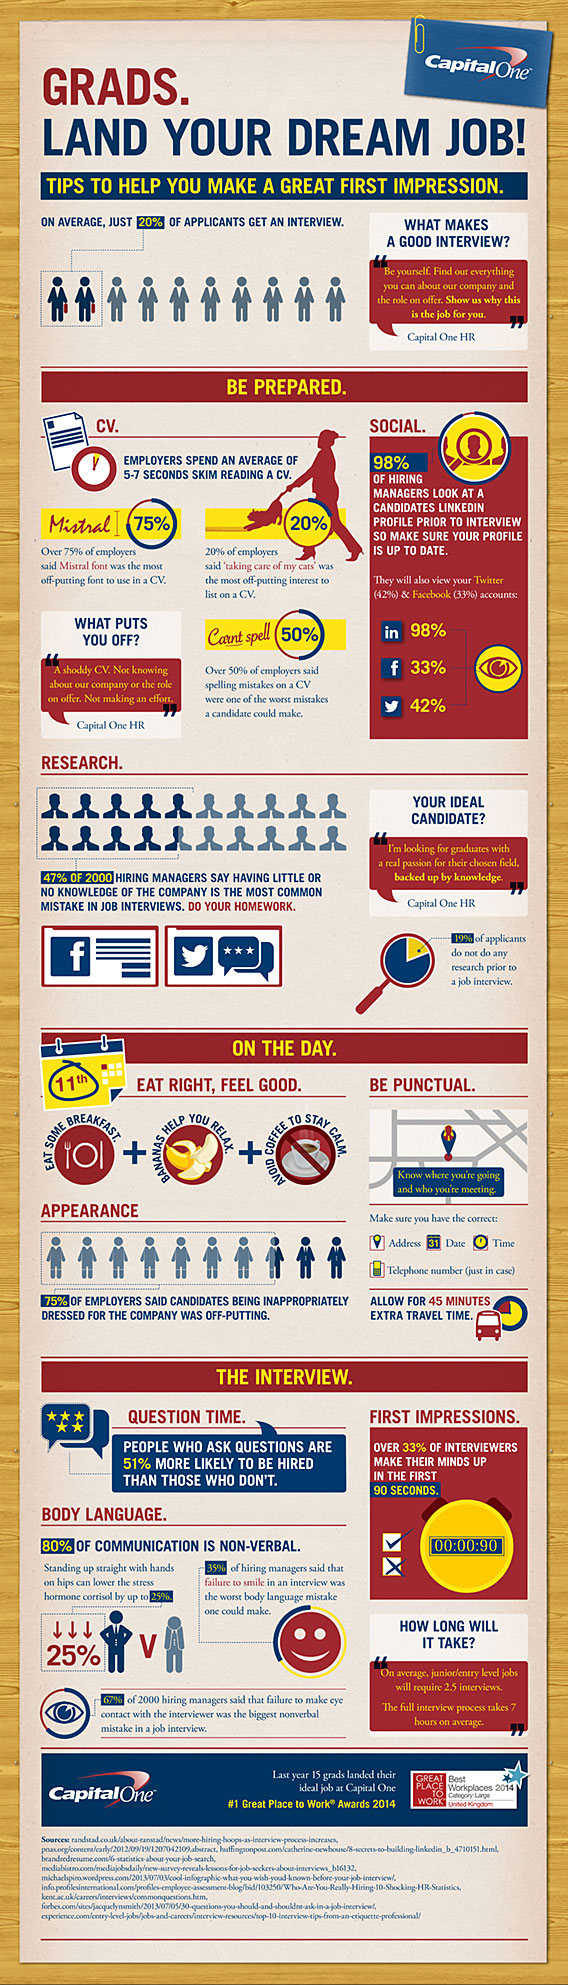 graduate-recruitment-job-interview-tips-infographic